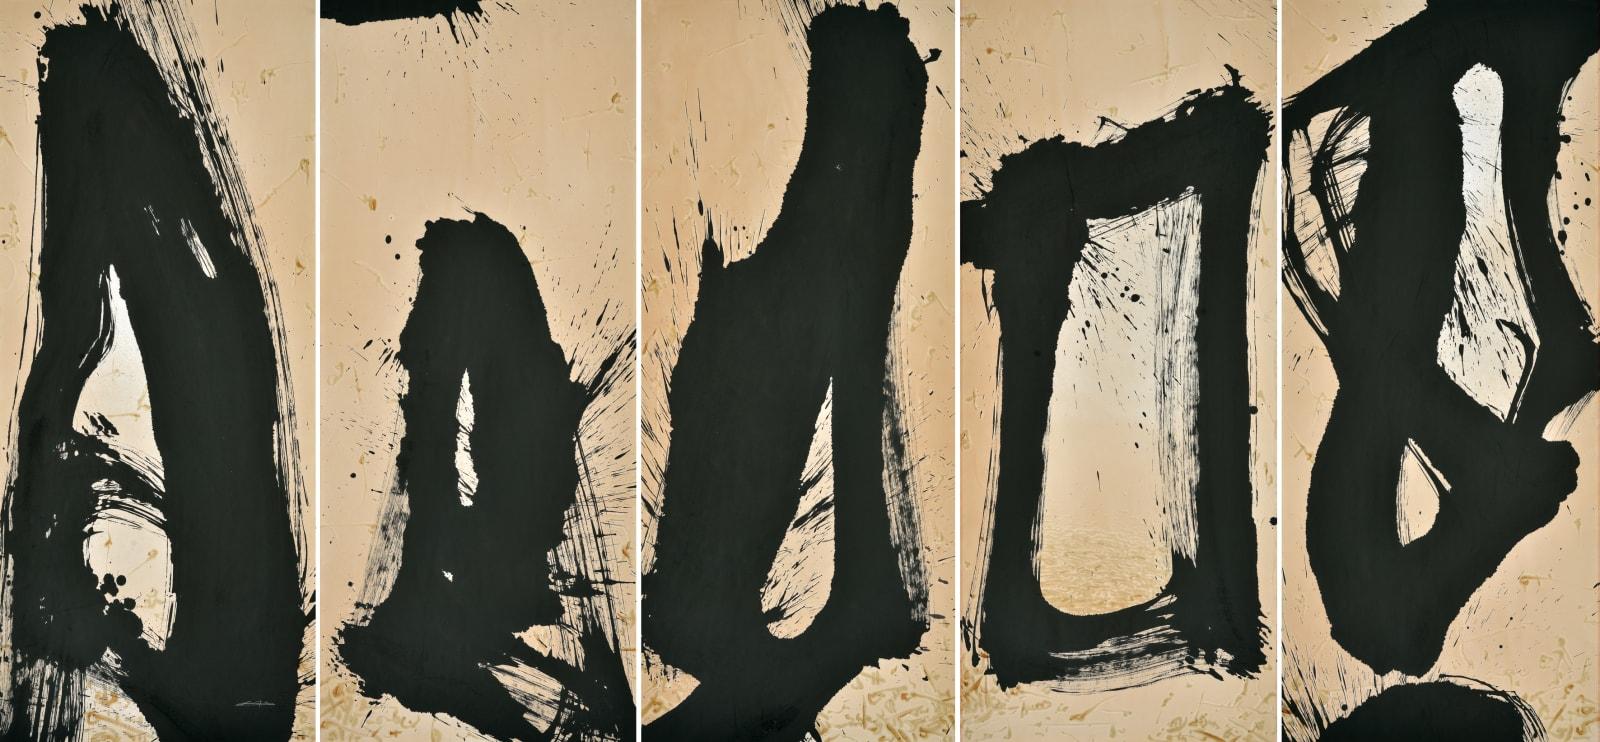 Qin Feng 秦風, The Five Line Diagram 五行圖, 2014